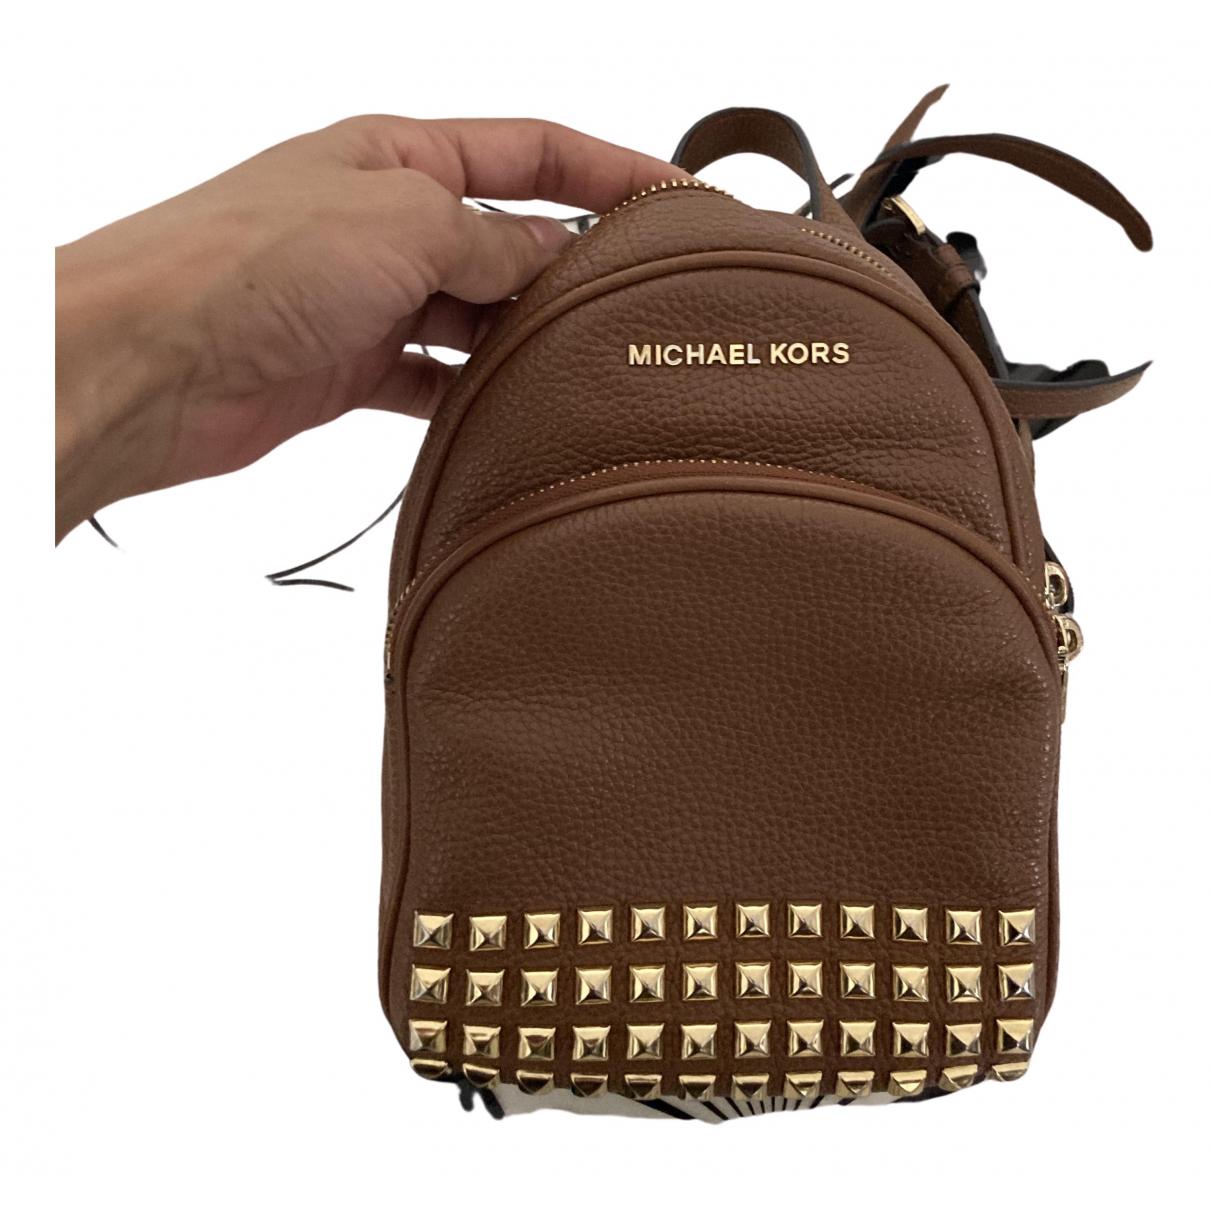 Michael Kors \N Camel Leather backpack for Women \N